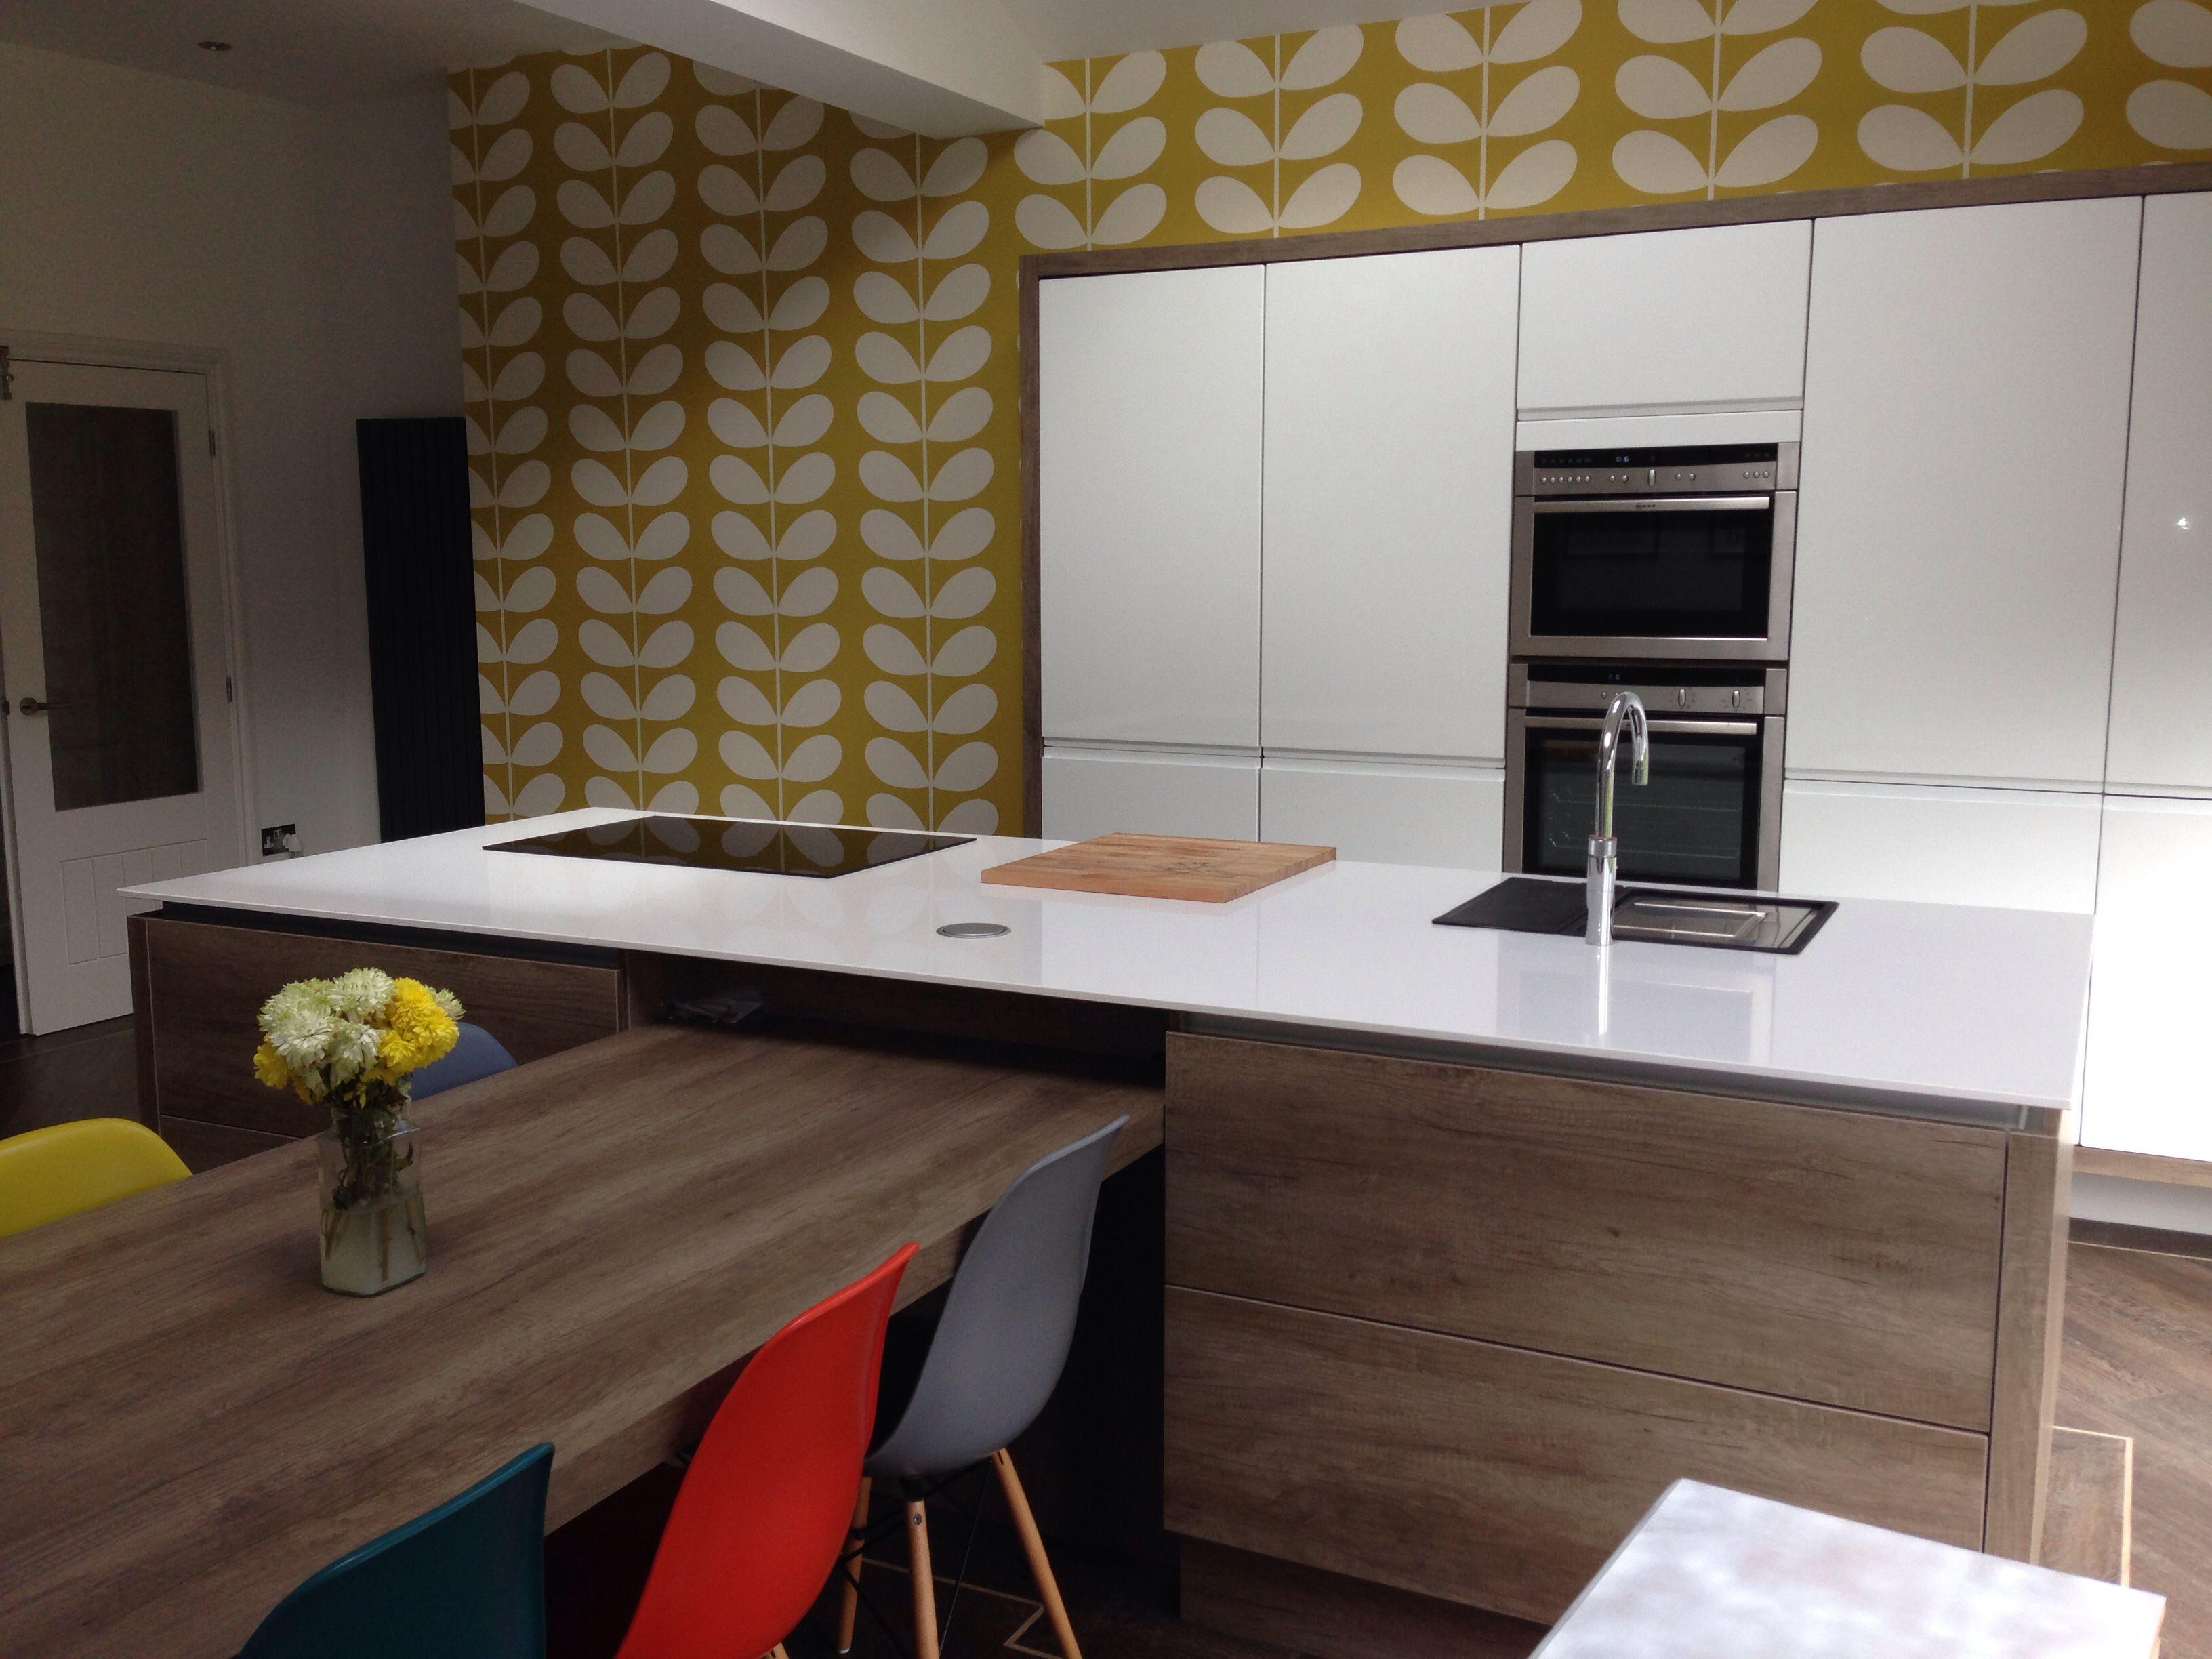 Love my new orla kiely giant stem wallpaper 💙 Home decor